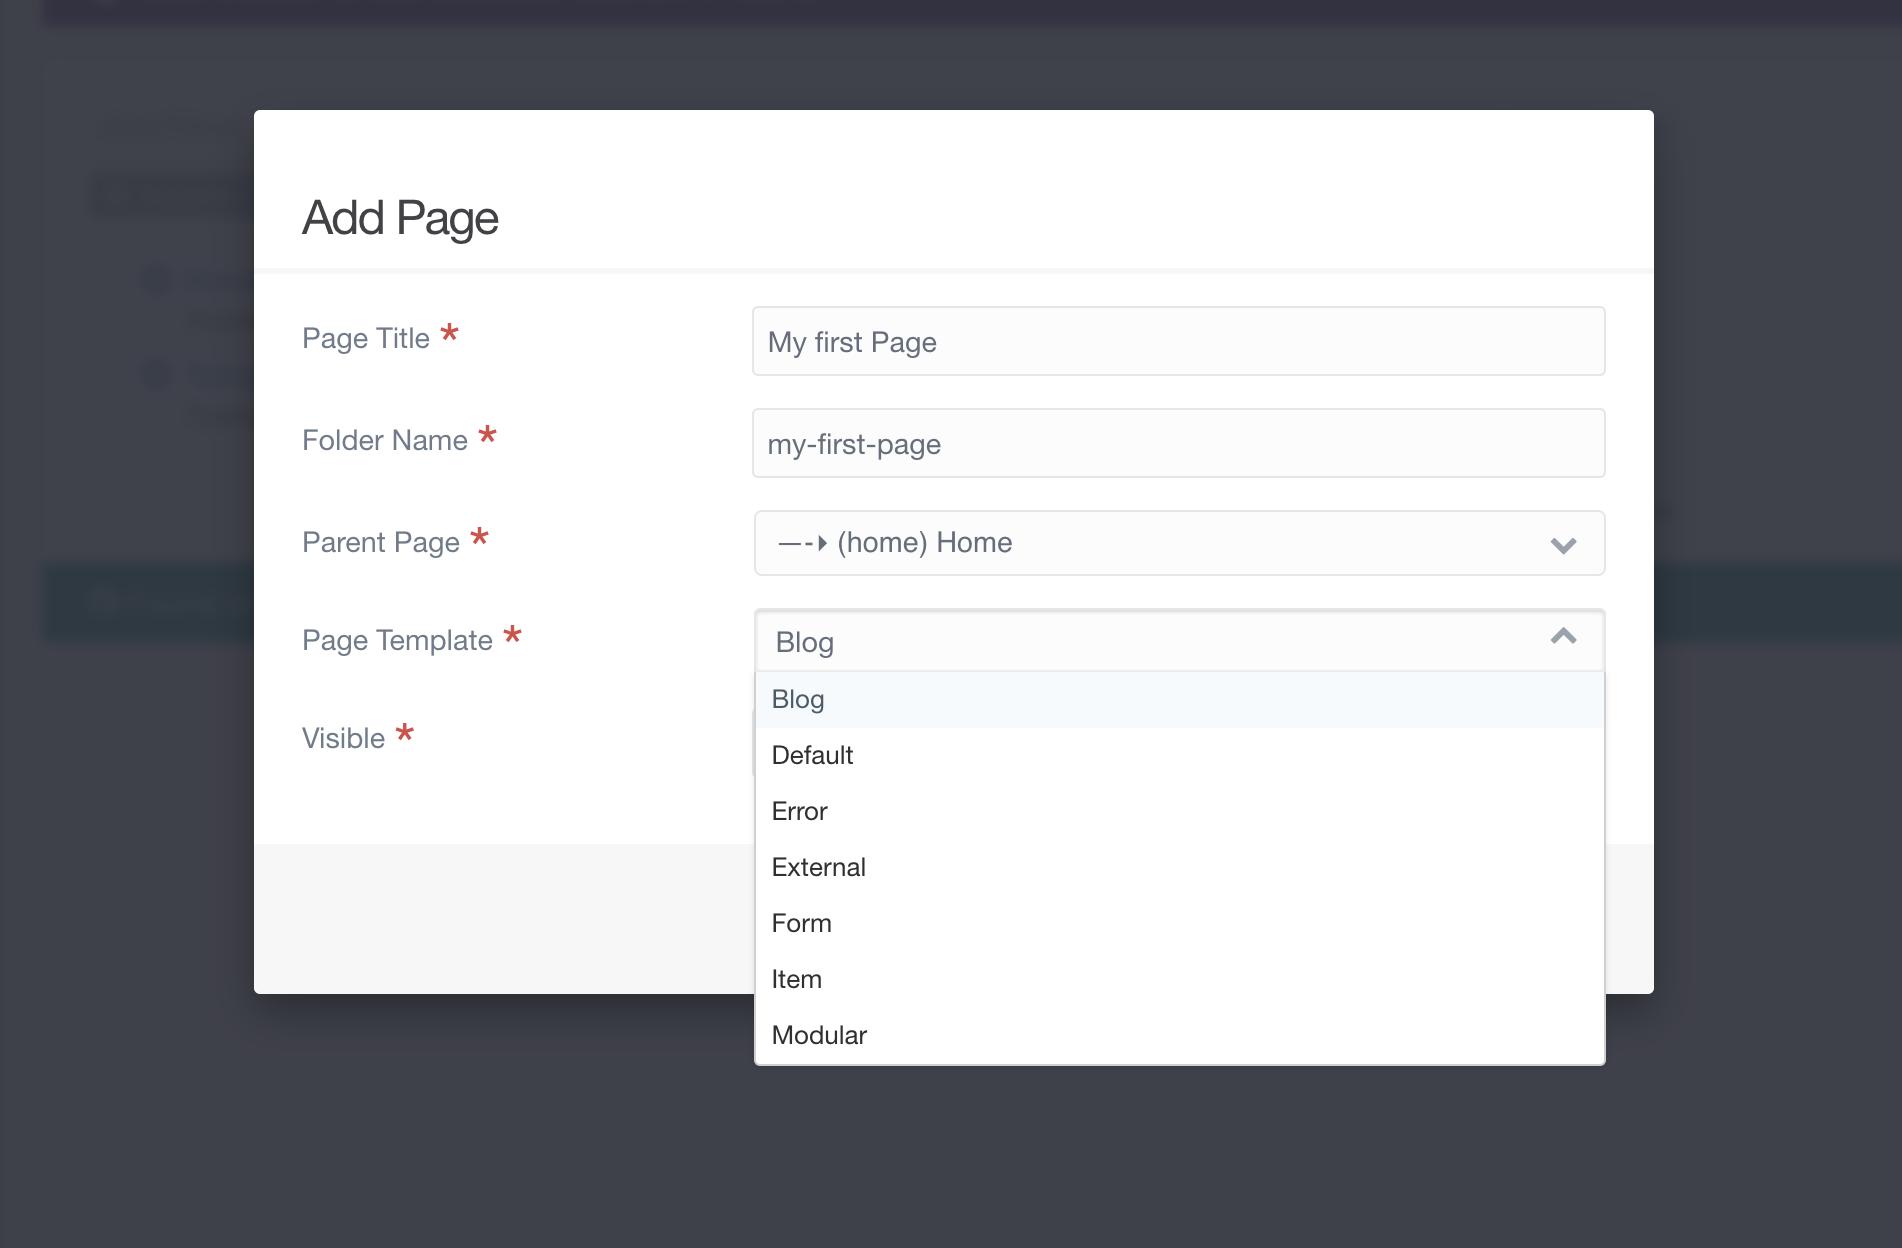 Screenshot of Page Template Drop-down Menu